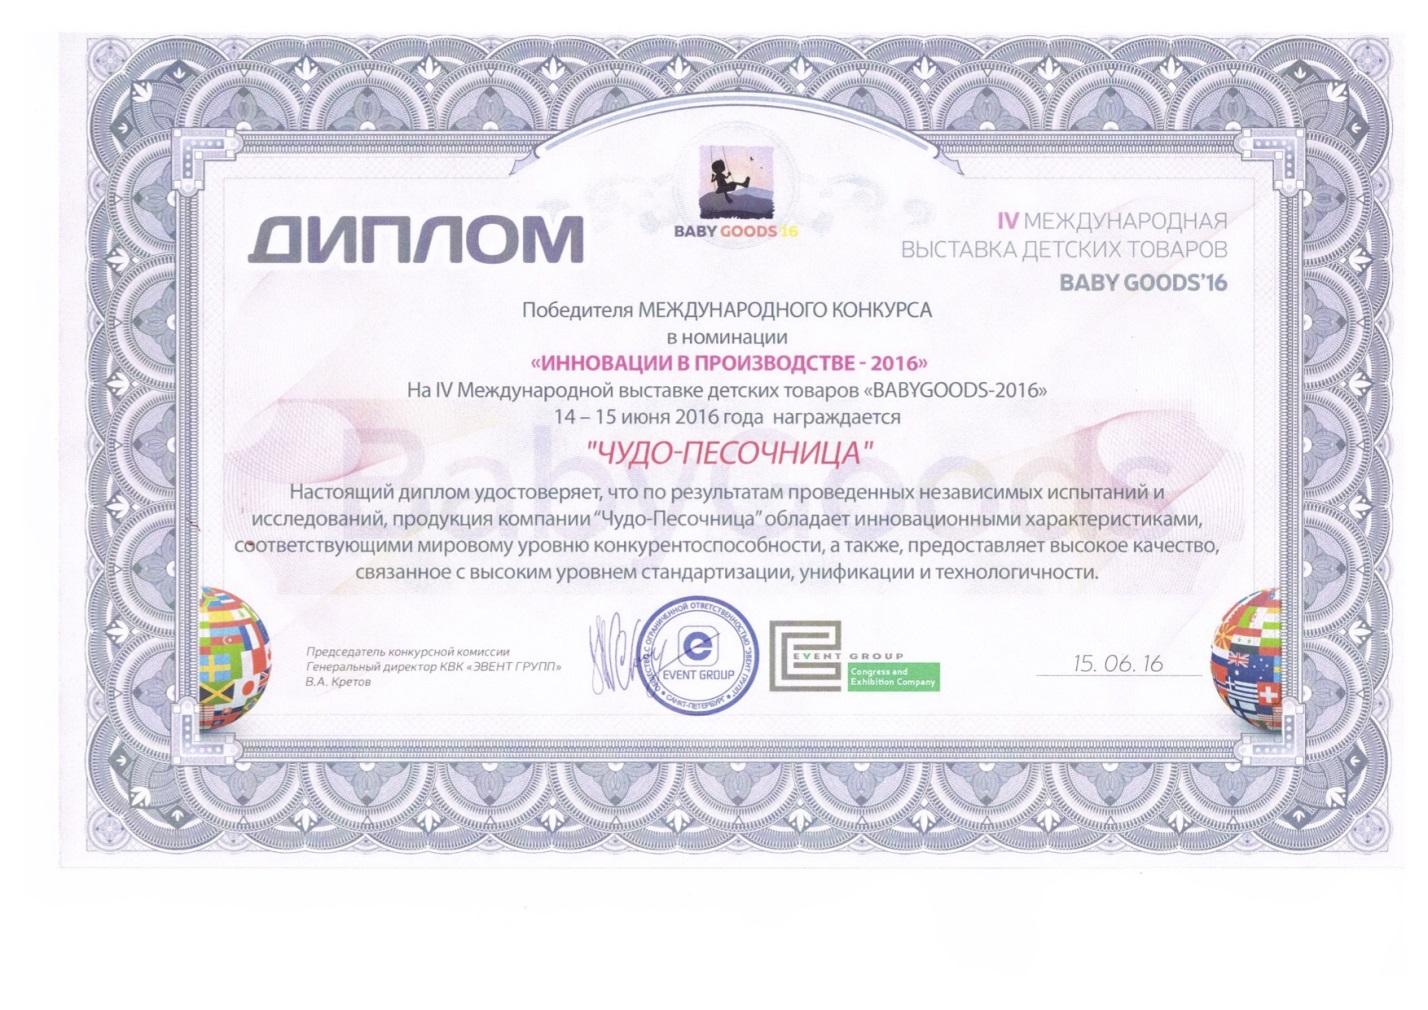 http://i.sand-therapy.ru/u/f8/6ec07e3f6911e69323aa3195ef3988/-/%D0%B4%D0%B8%D0%BF%D0%BB%D0%BE%D0%BC%20001.jpg